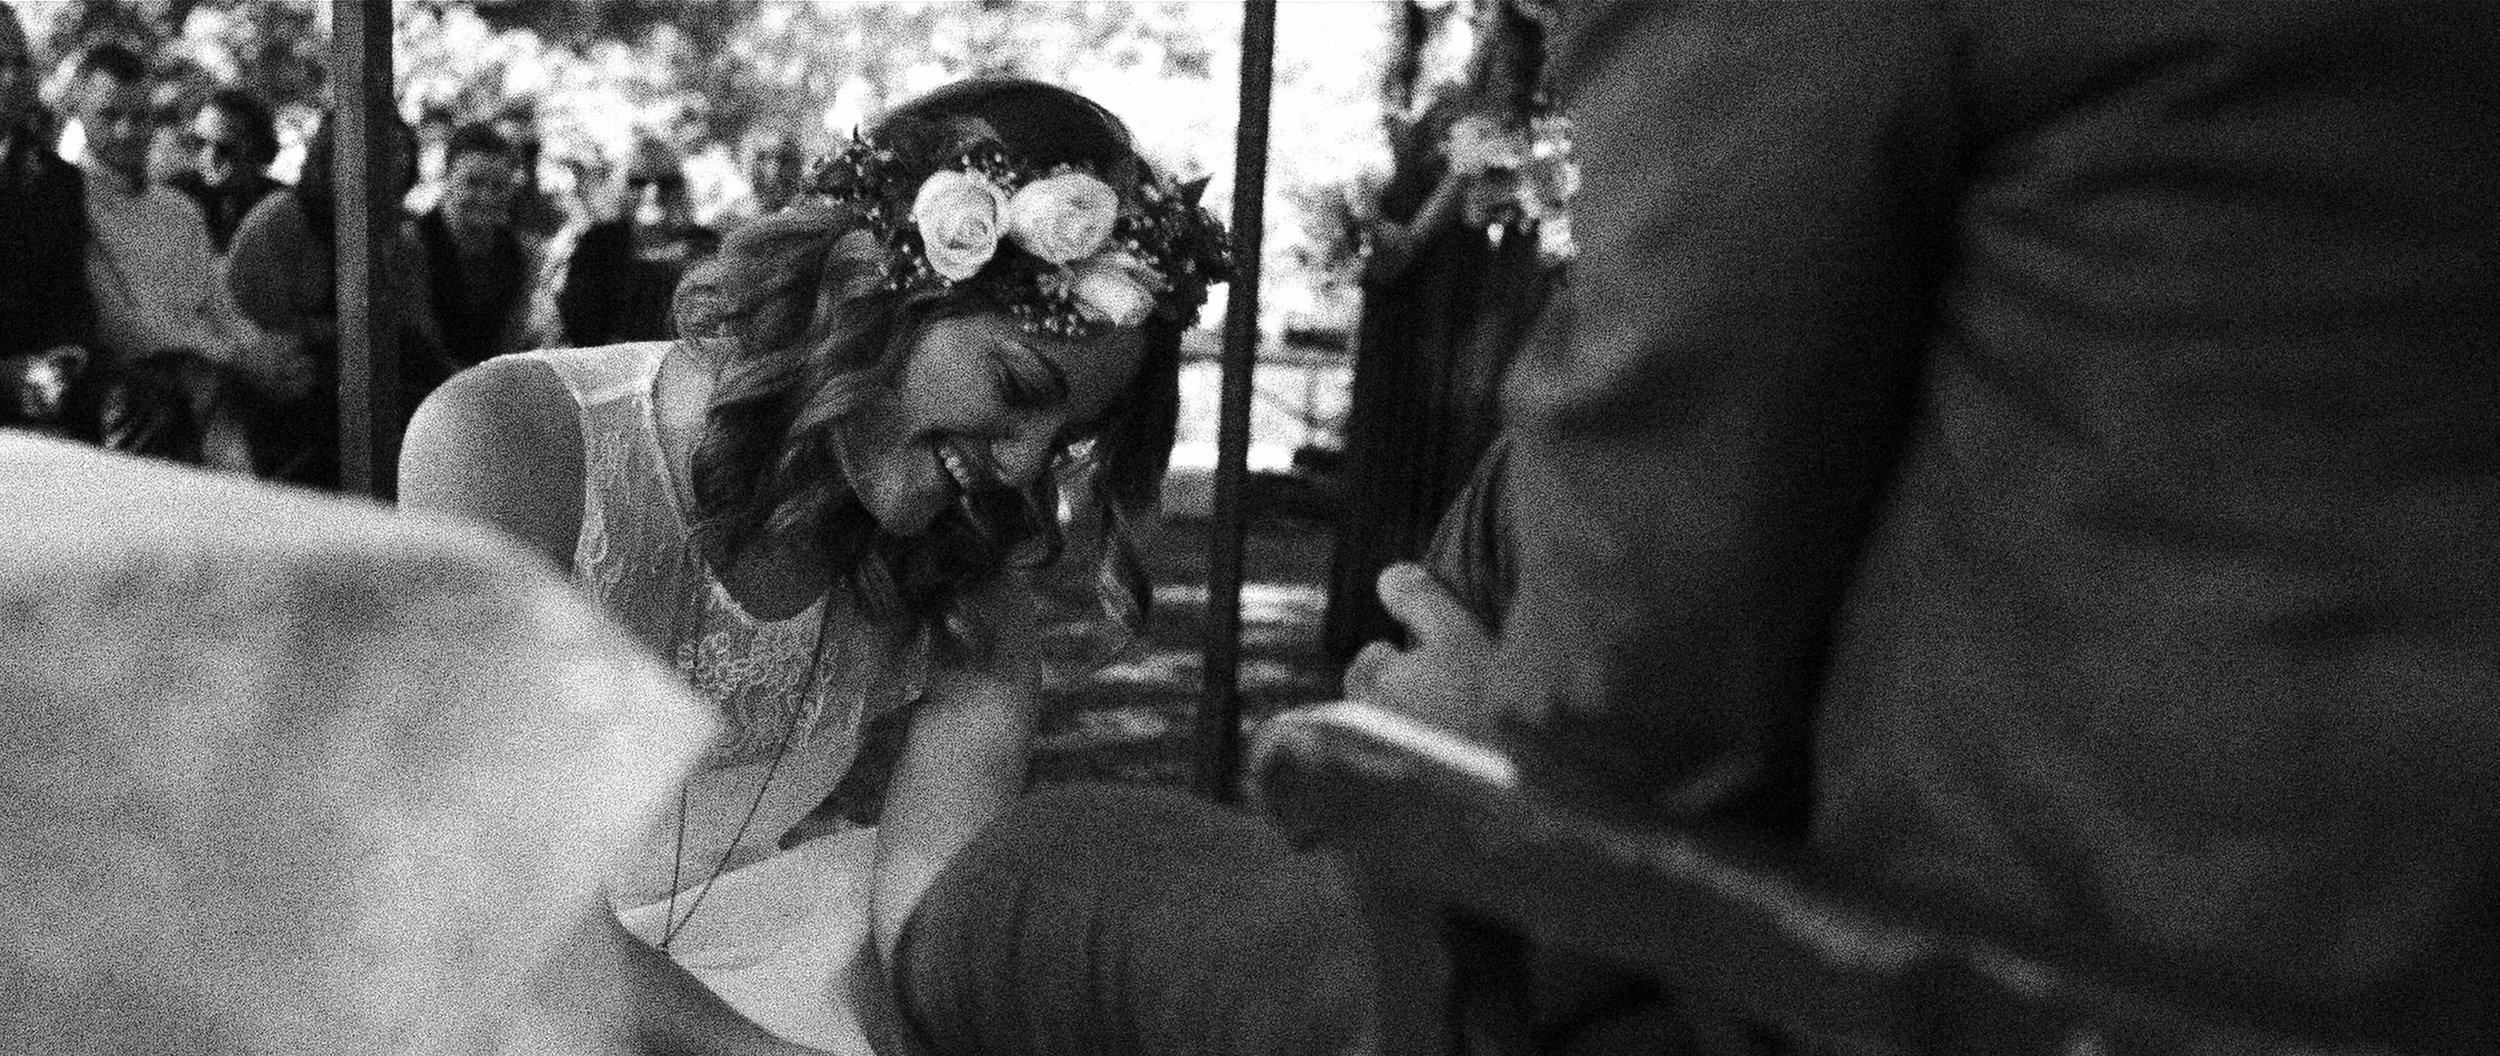 vancouver-wedding-videography168.jpg